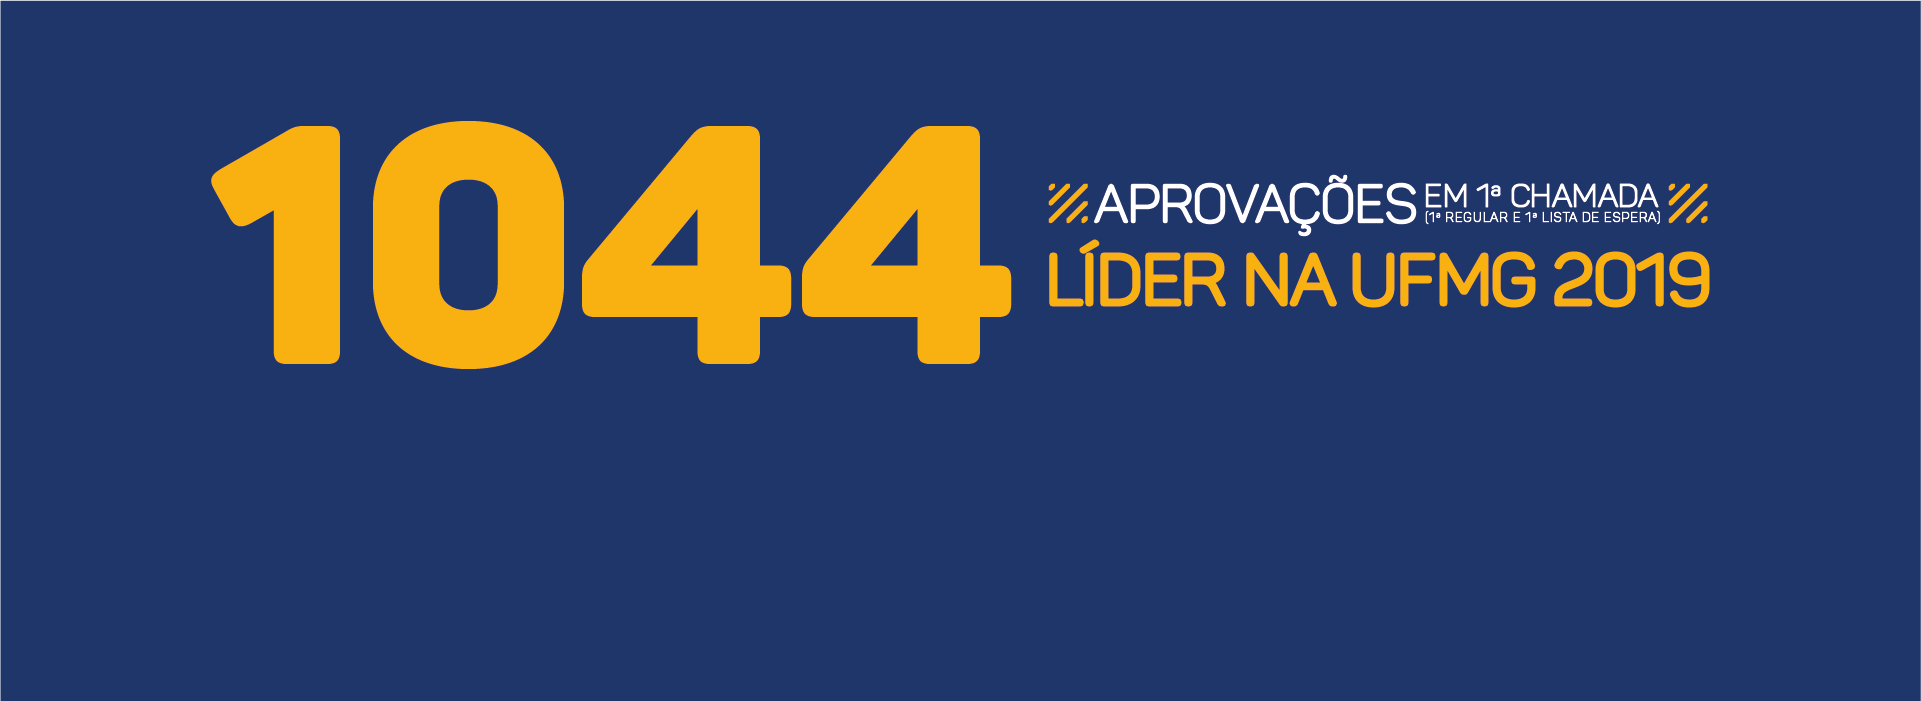 18-02 - Lista de Aprovados UFMG 2019_capa